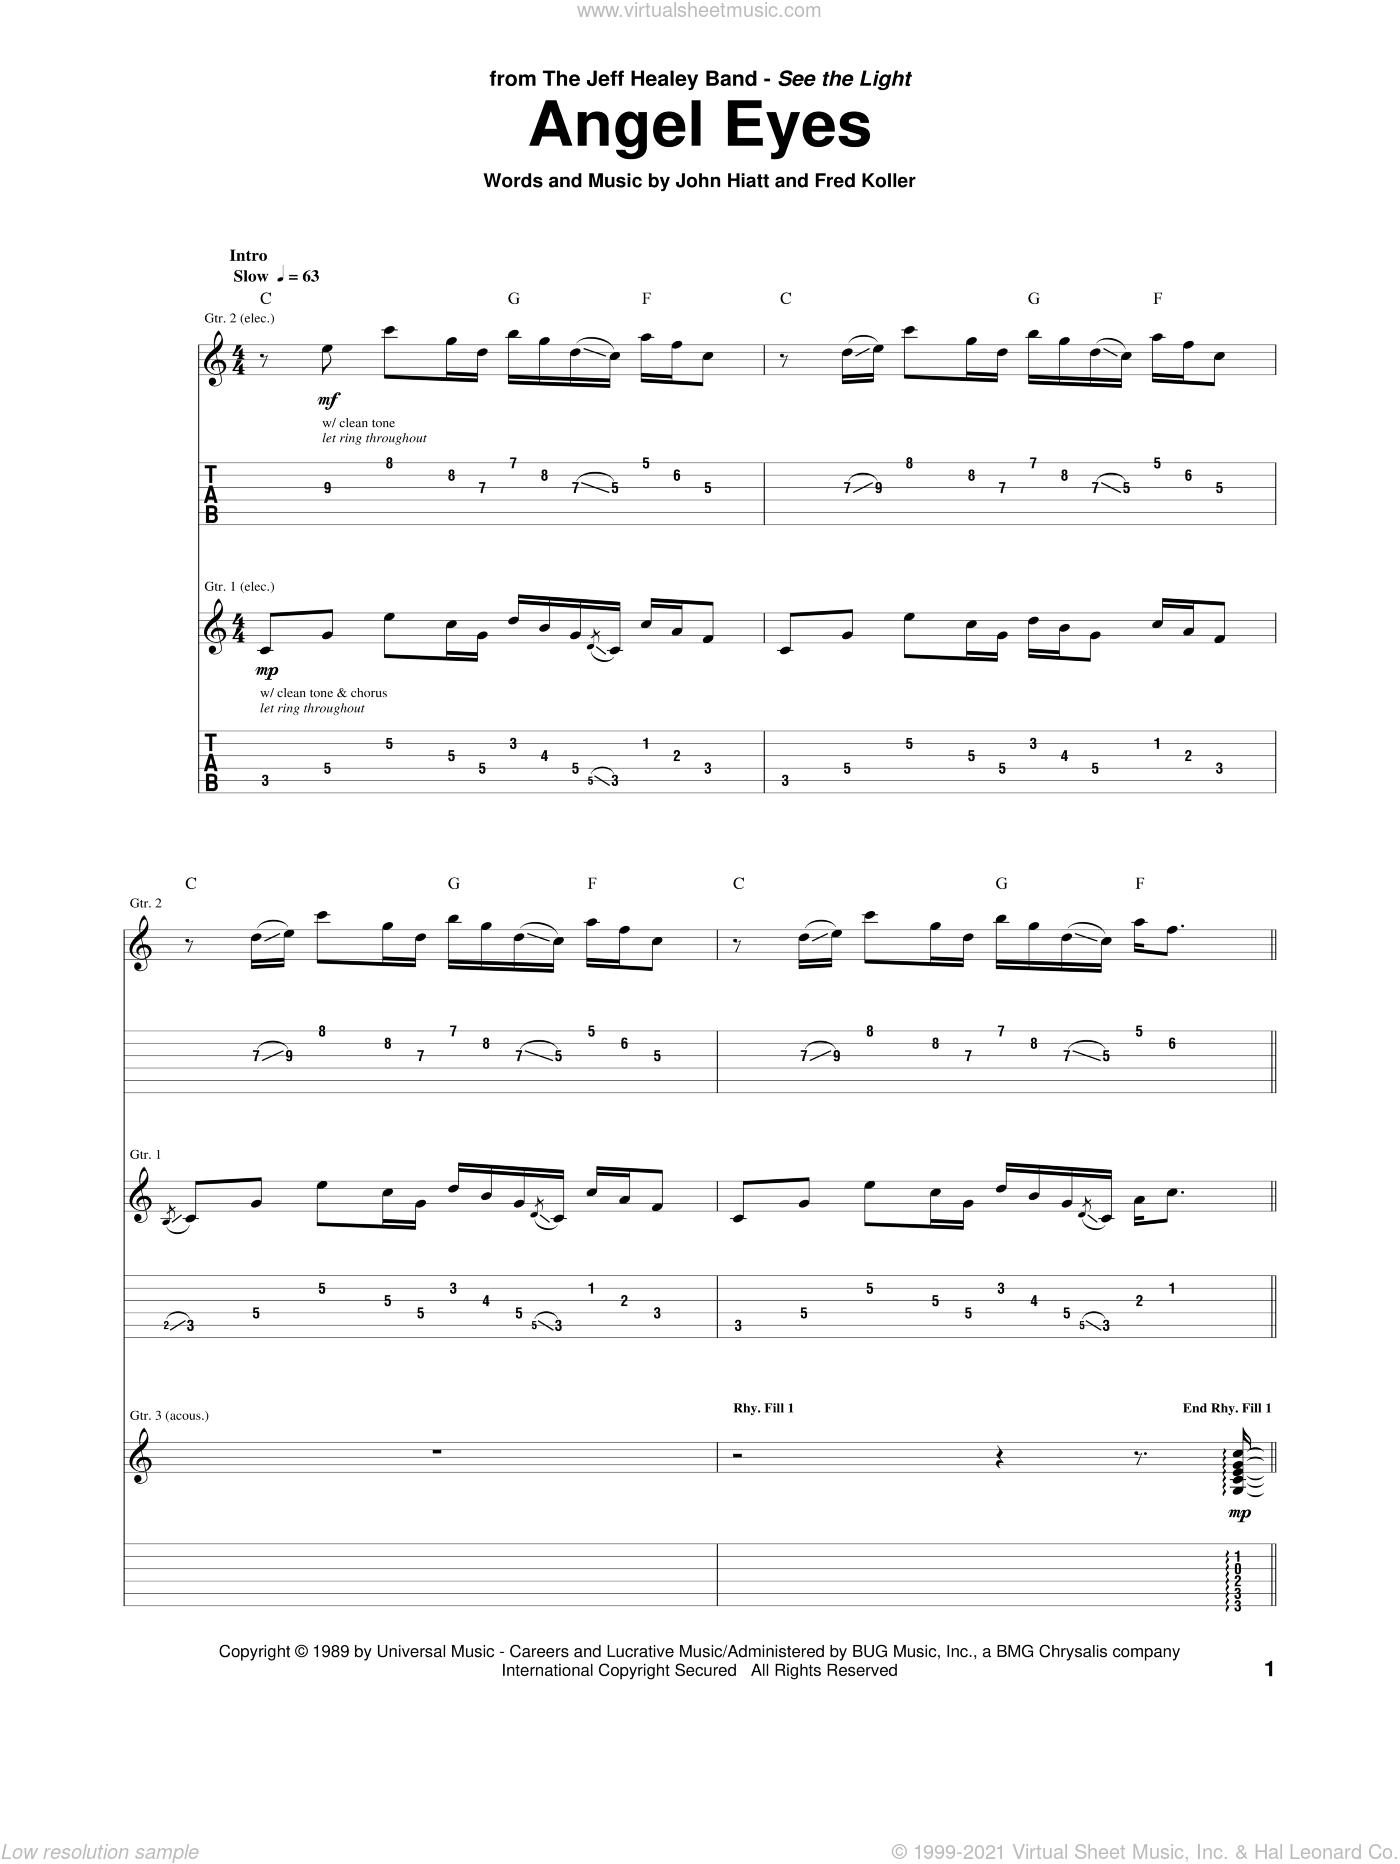 Angel Eyes sheet music for guitar (tablature) by Jeff Healey Band, Fred Koller and John Hiatt, intermediate skill level